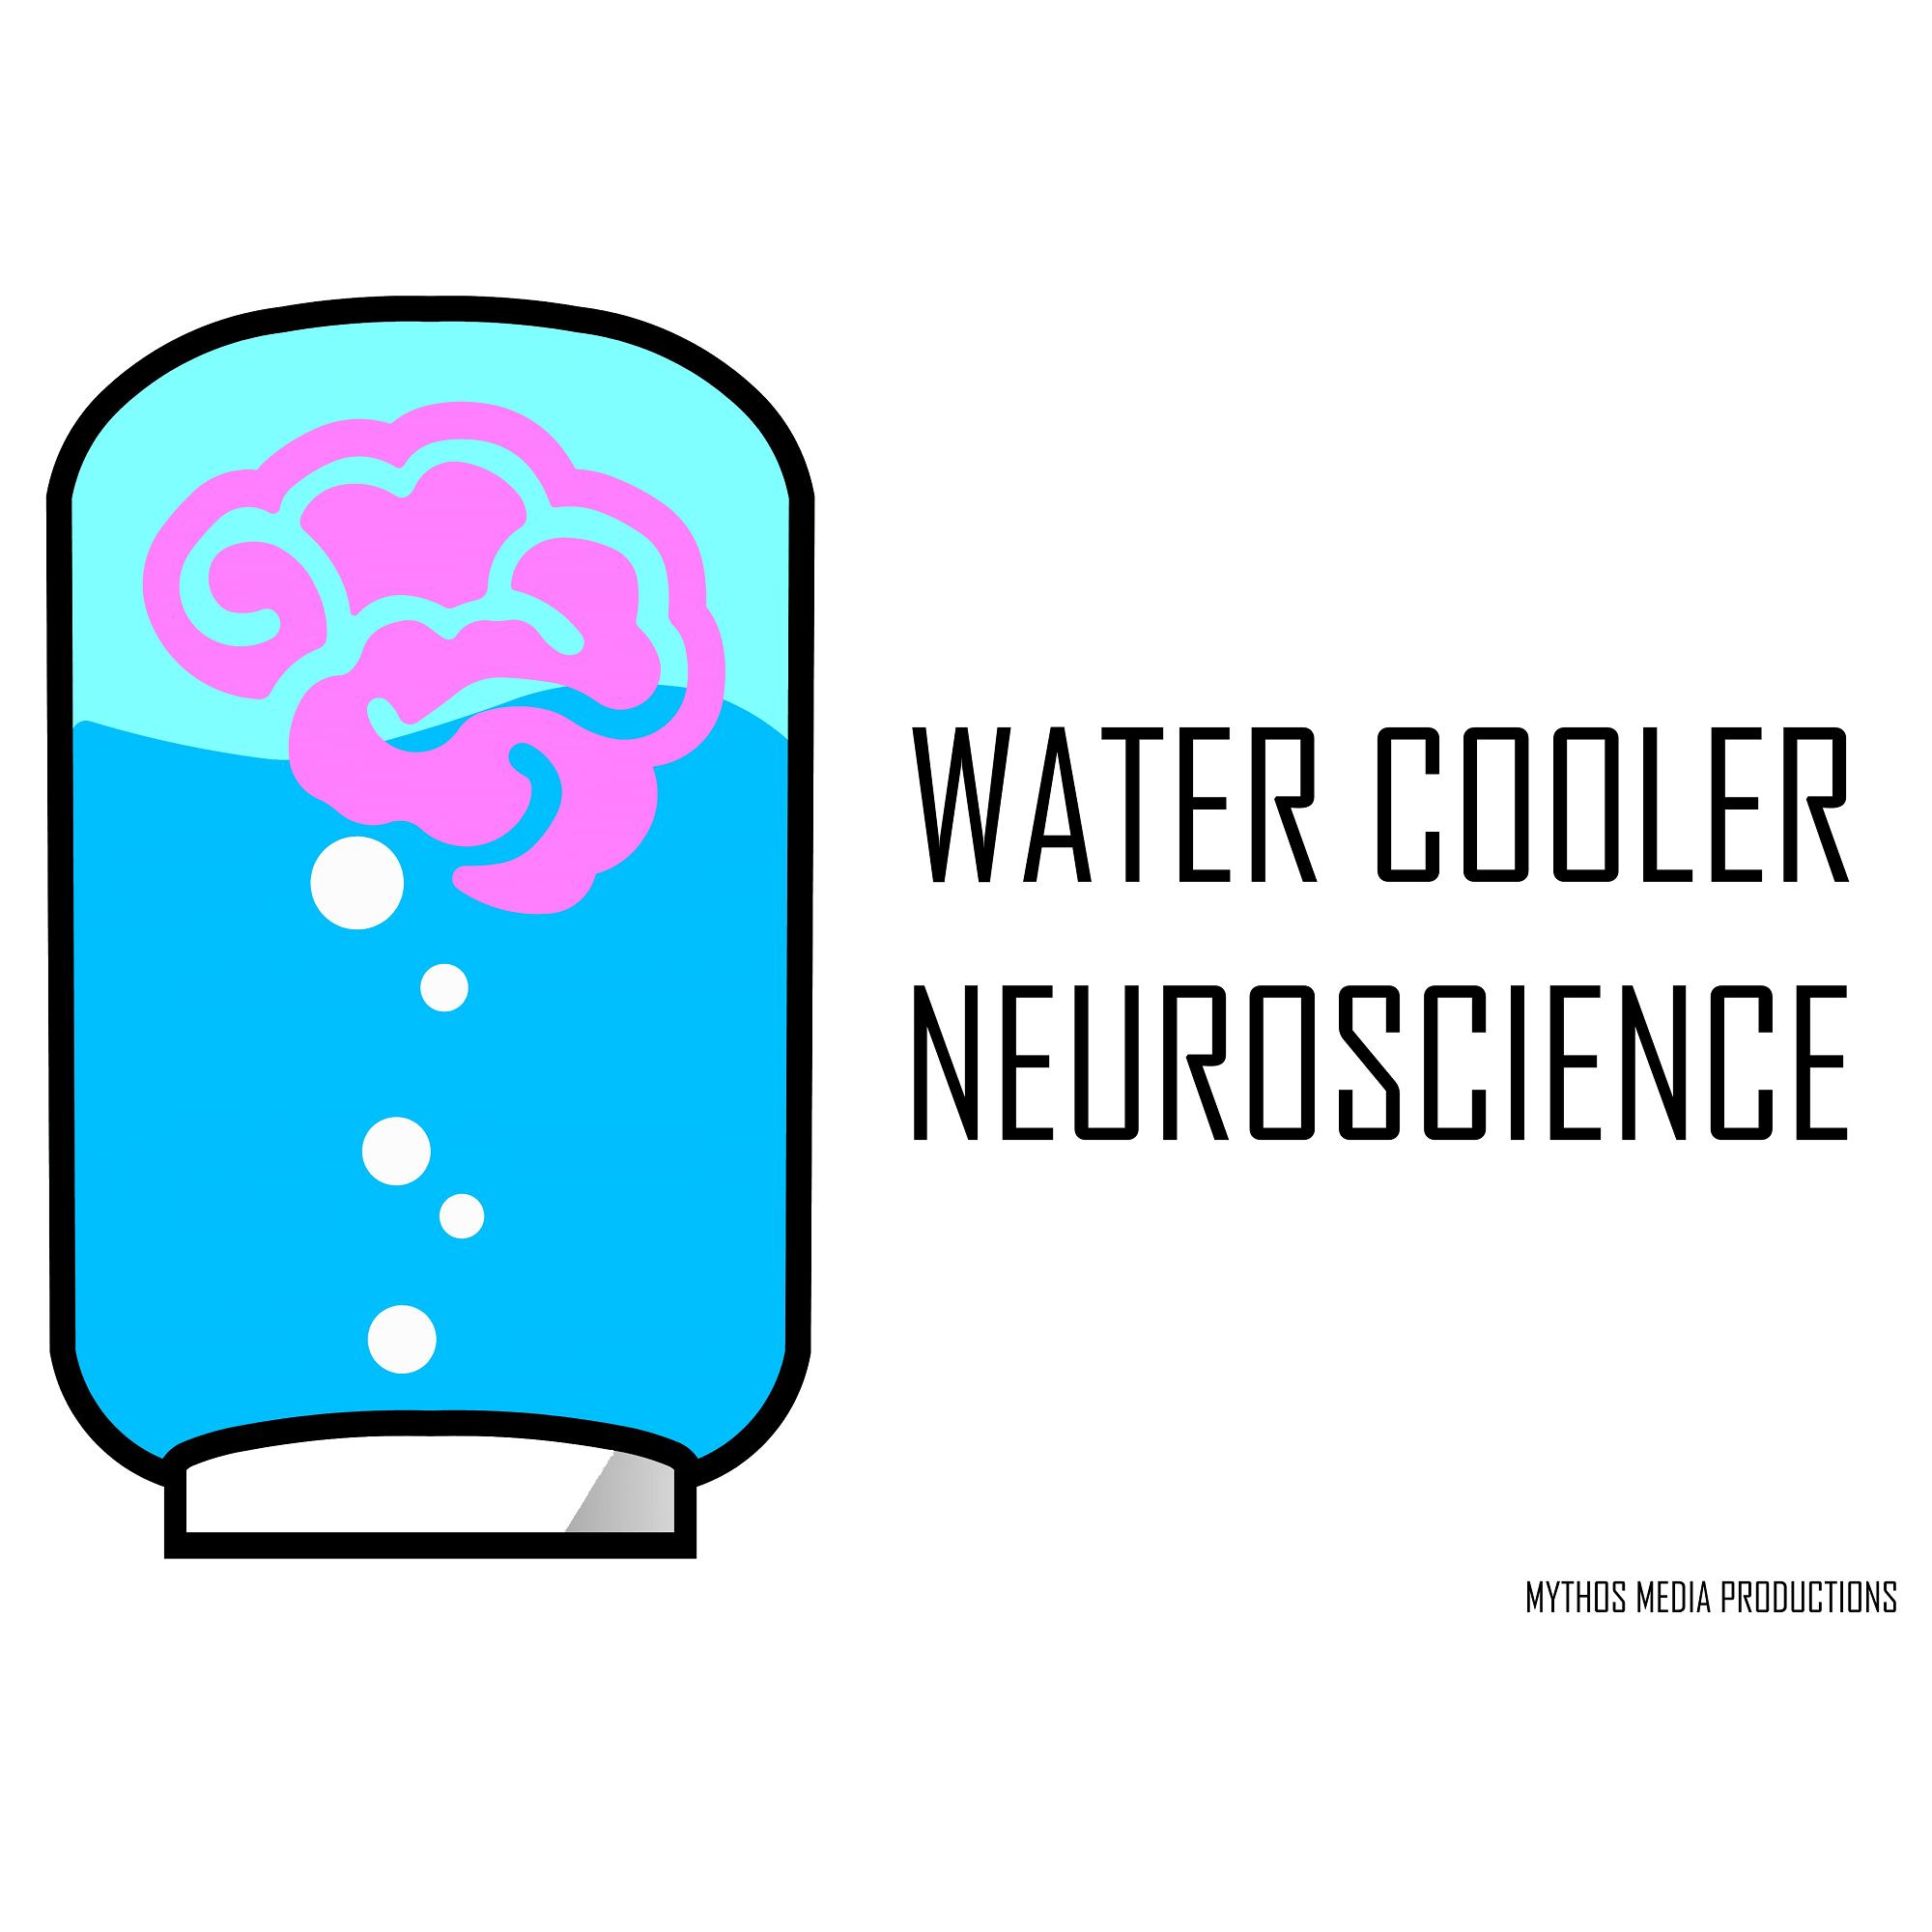 WaterCooler Neuroscience